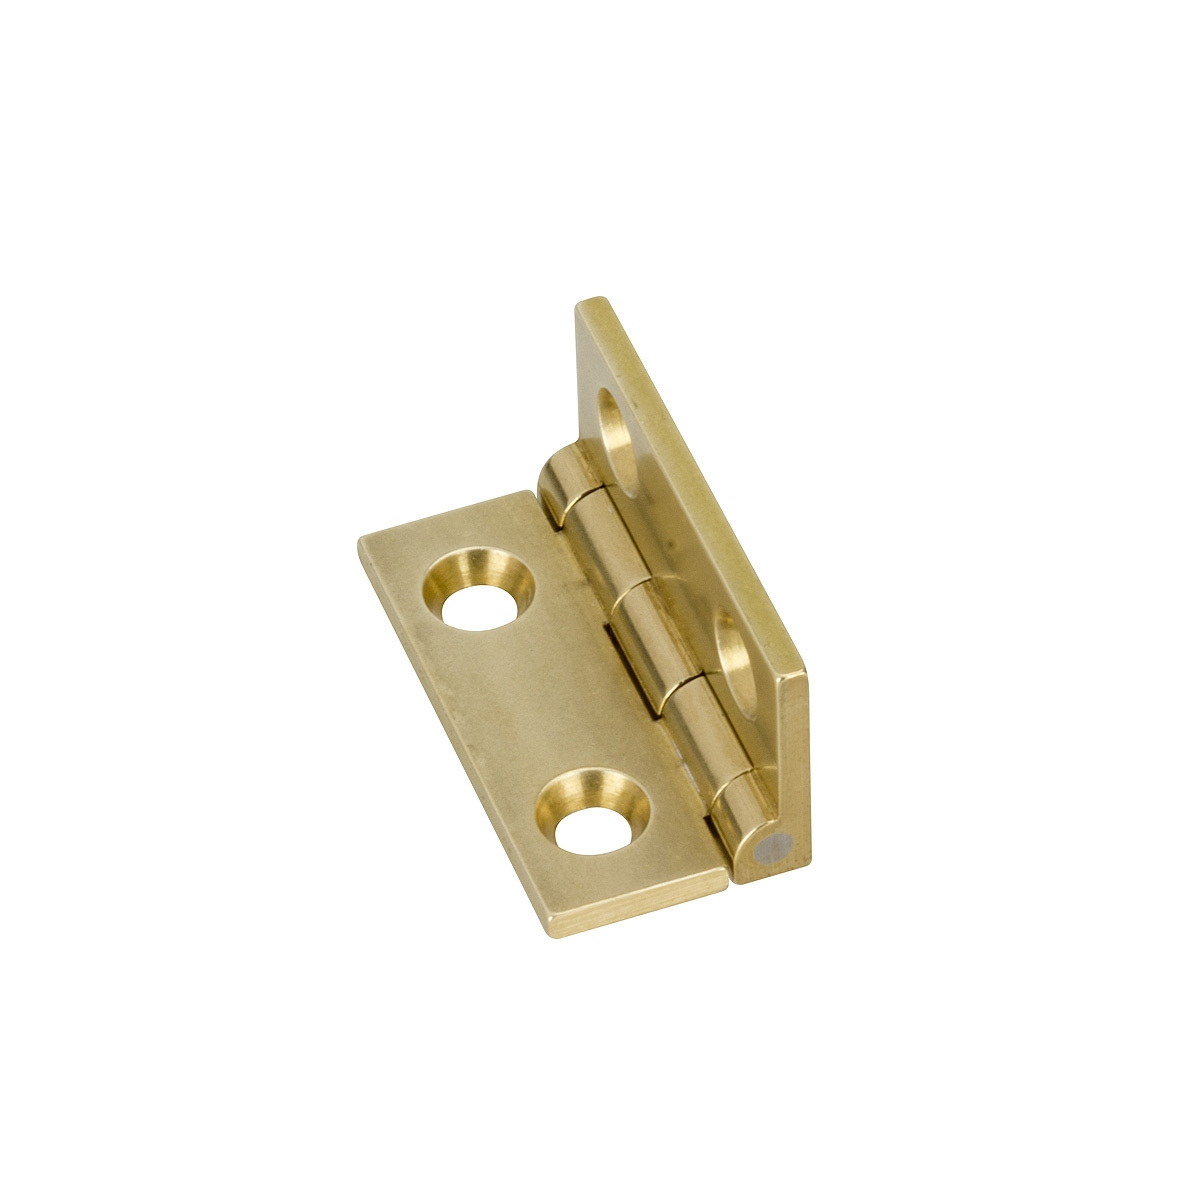 brusso 95 degree stop hinges brass or stainless john lloyd fine